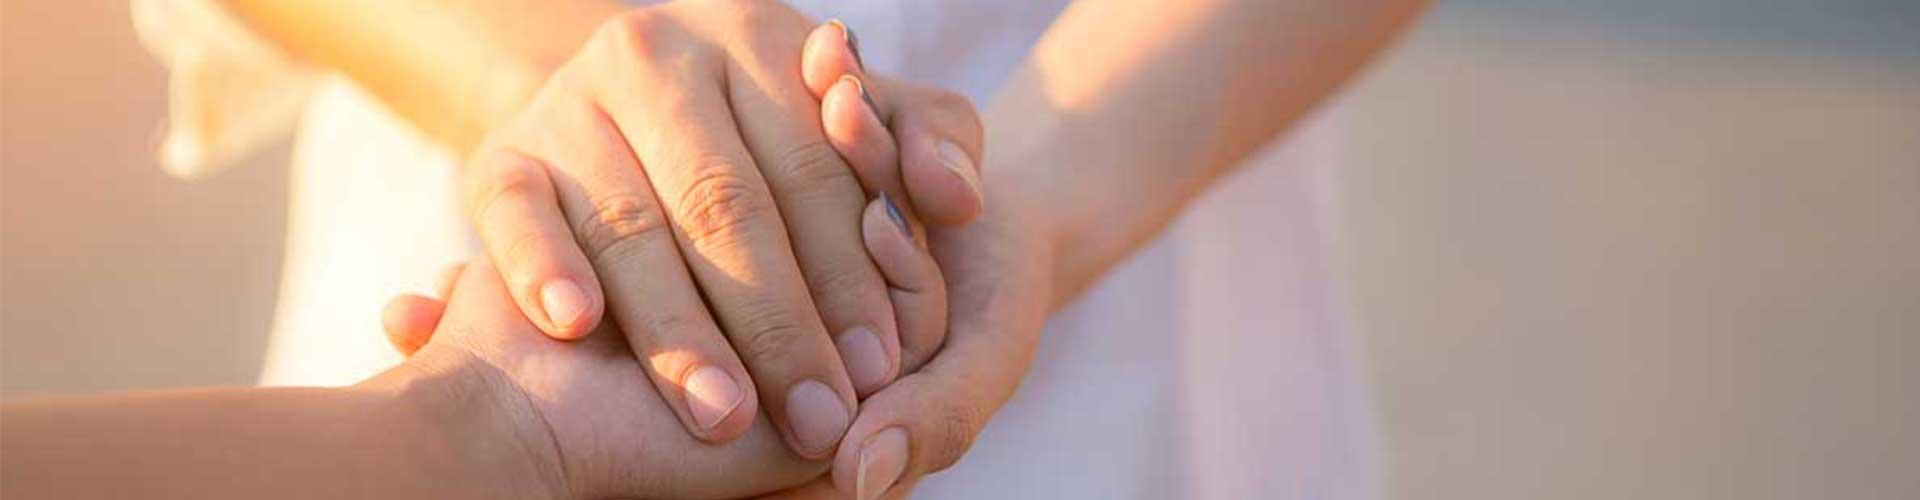 Man And Woman Holding Hands Closeup Billboard